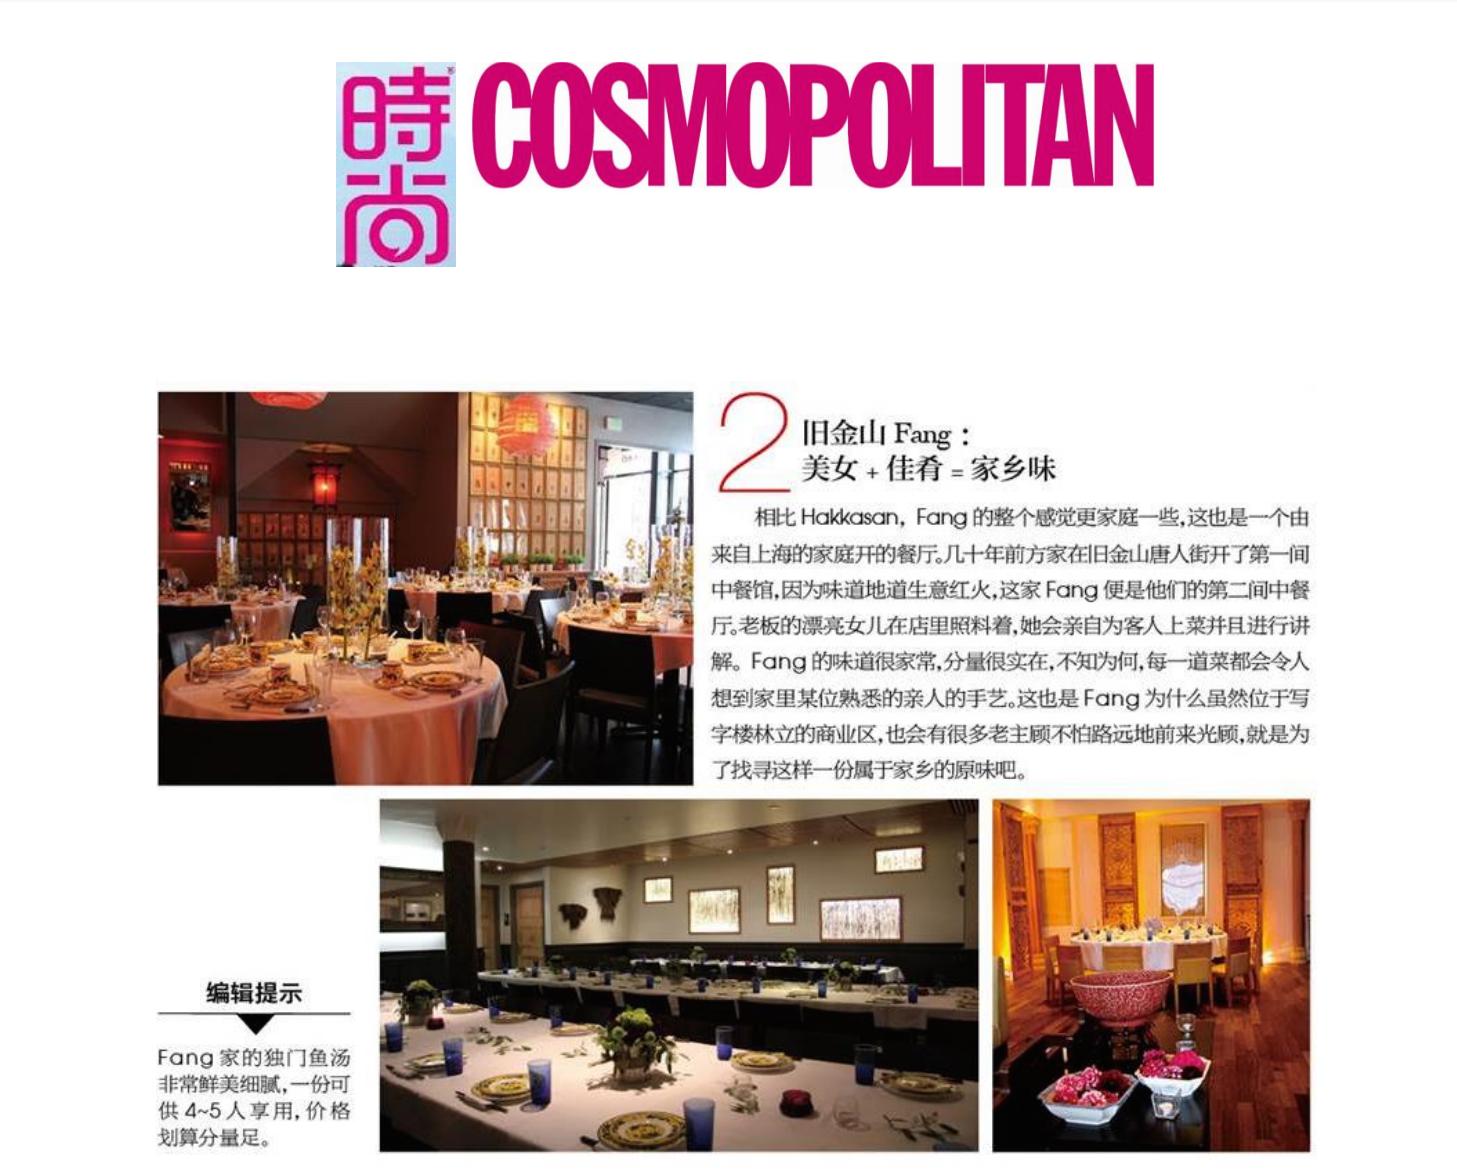 Cosmopolitan china.png